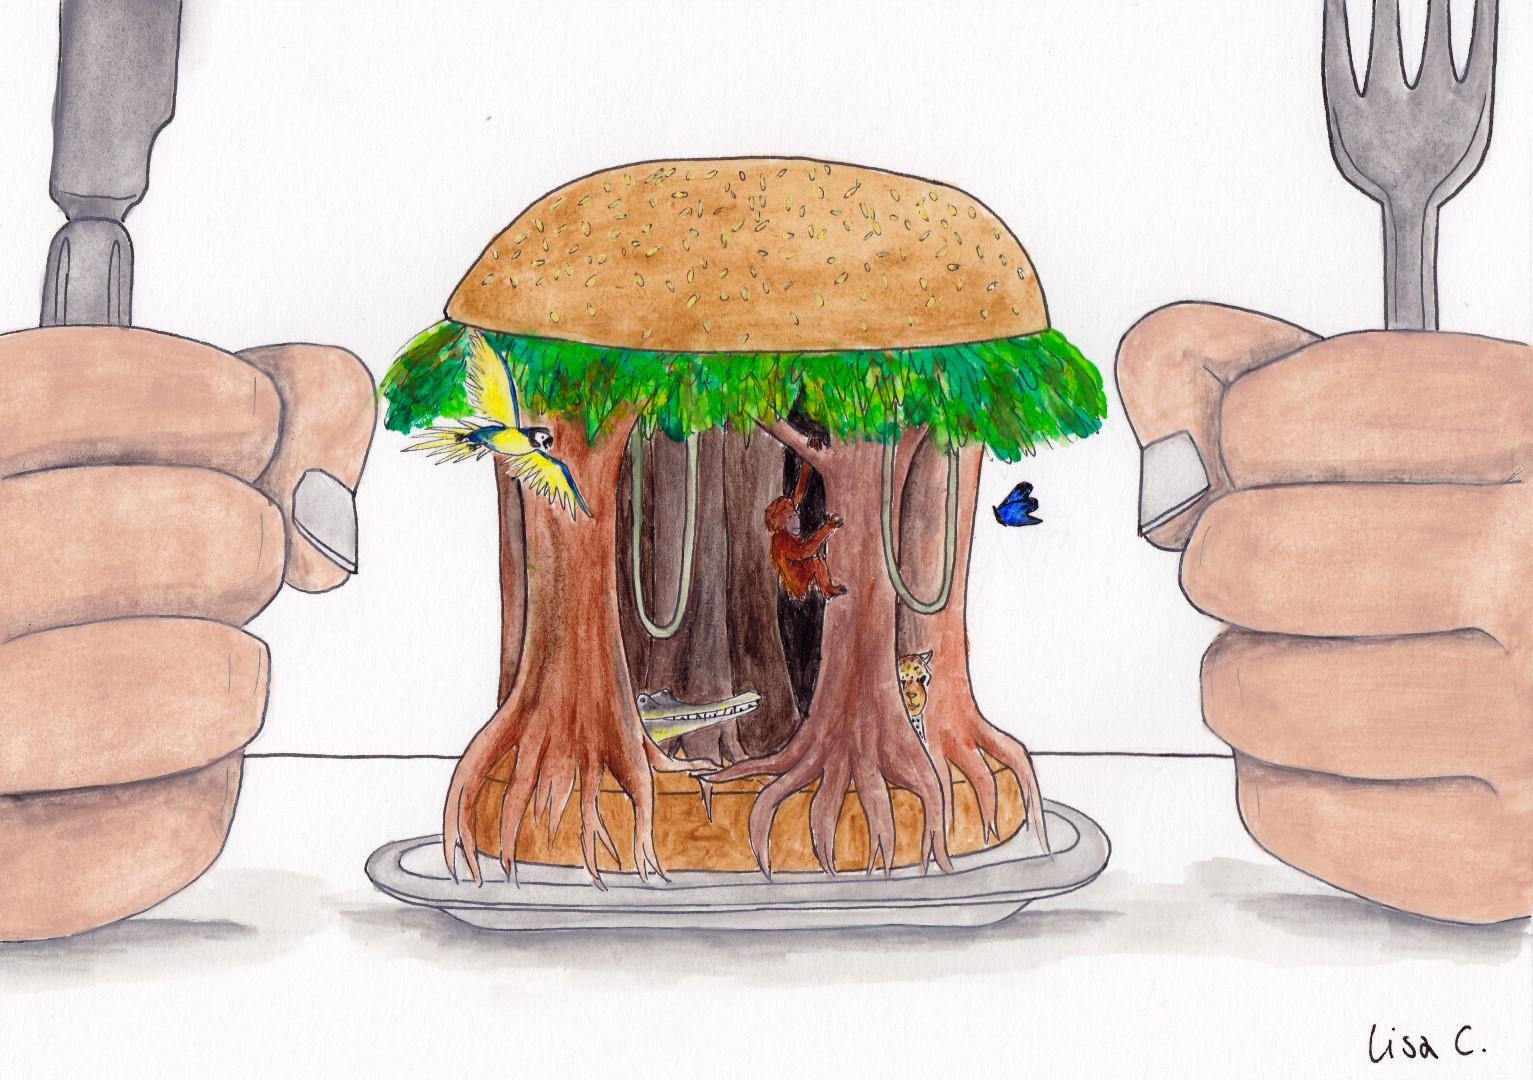 Karikaturen von Lisa Cuthbertson